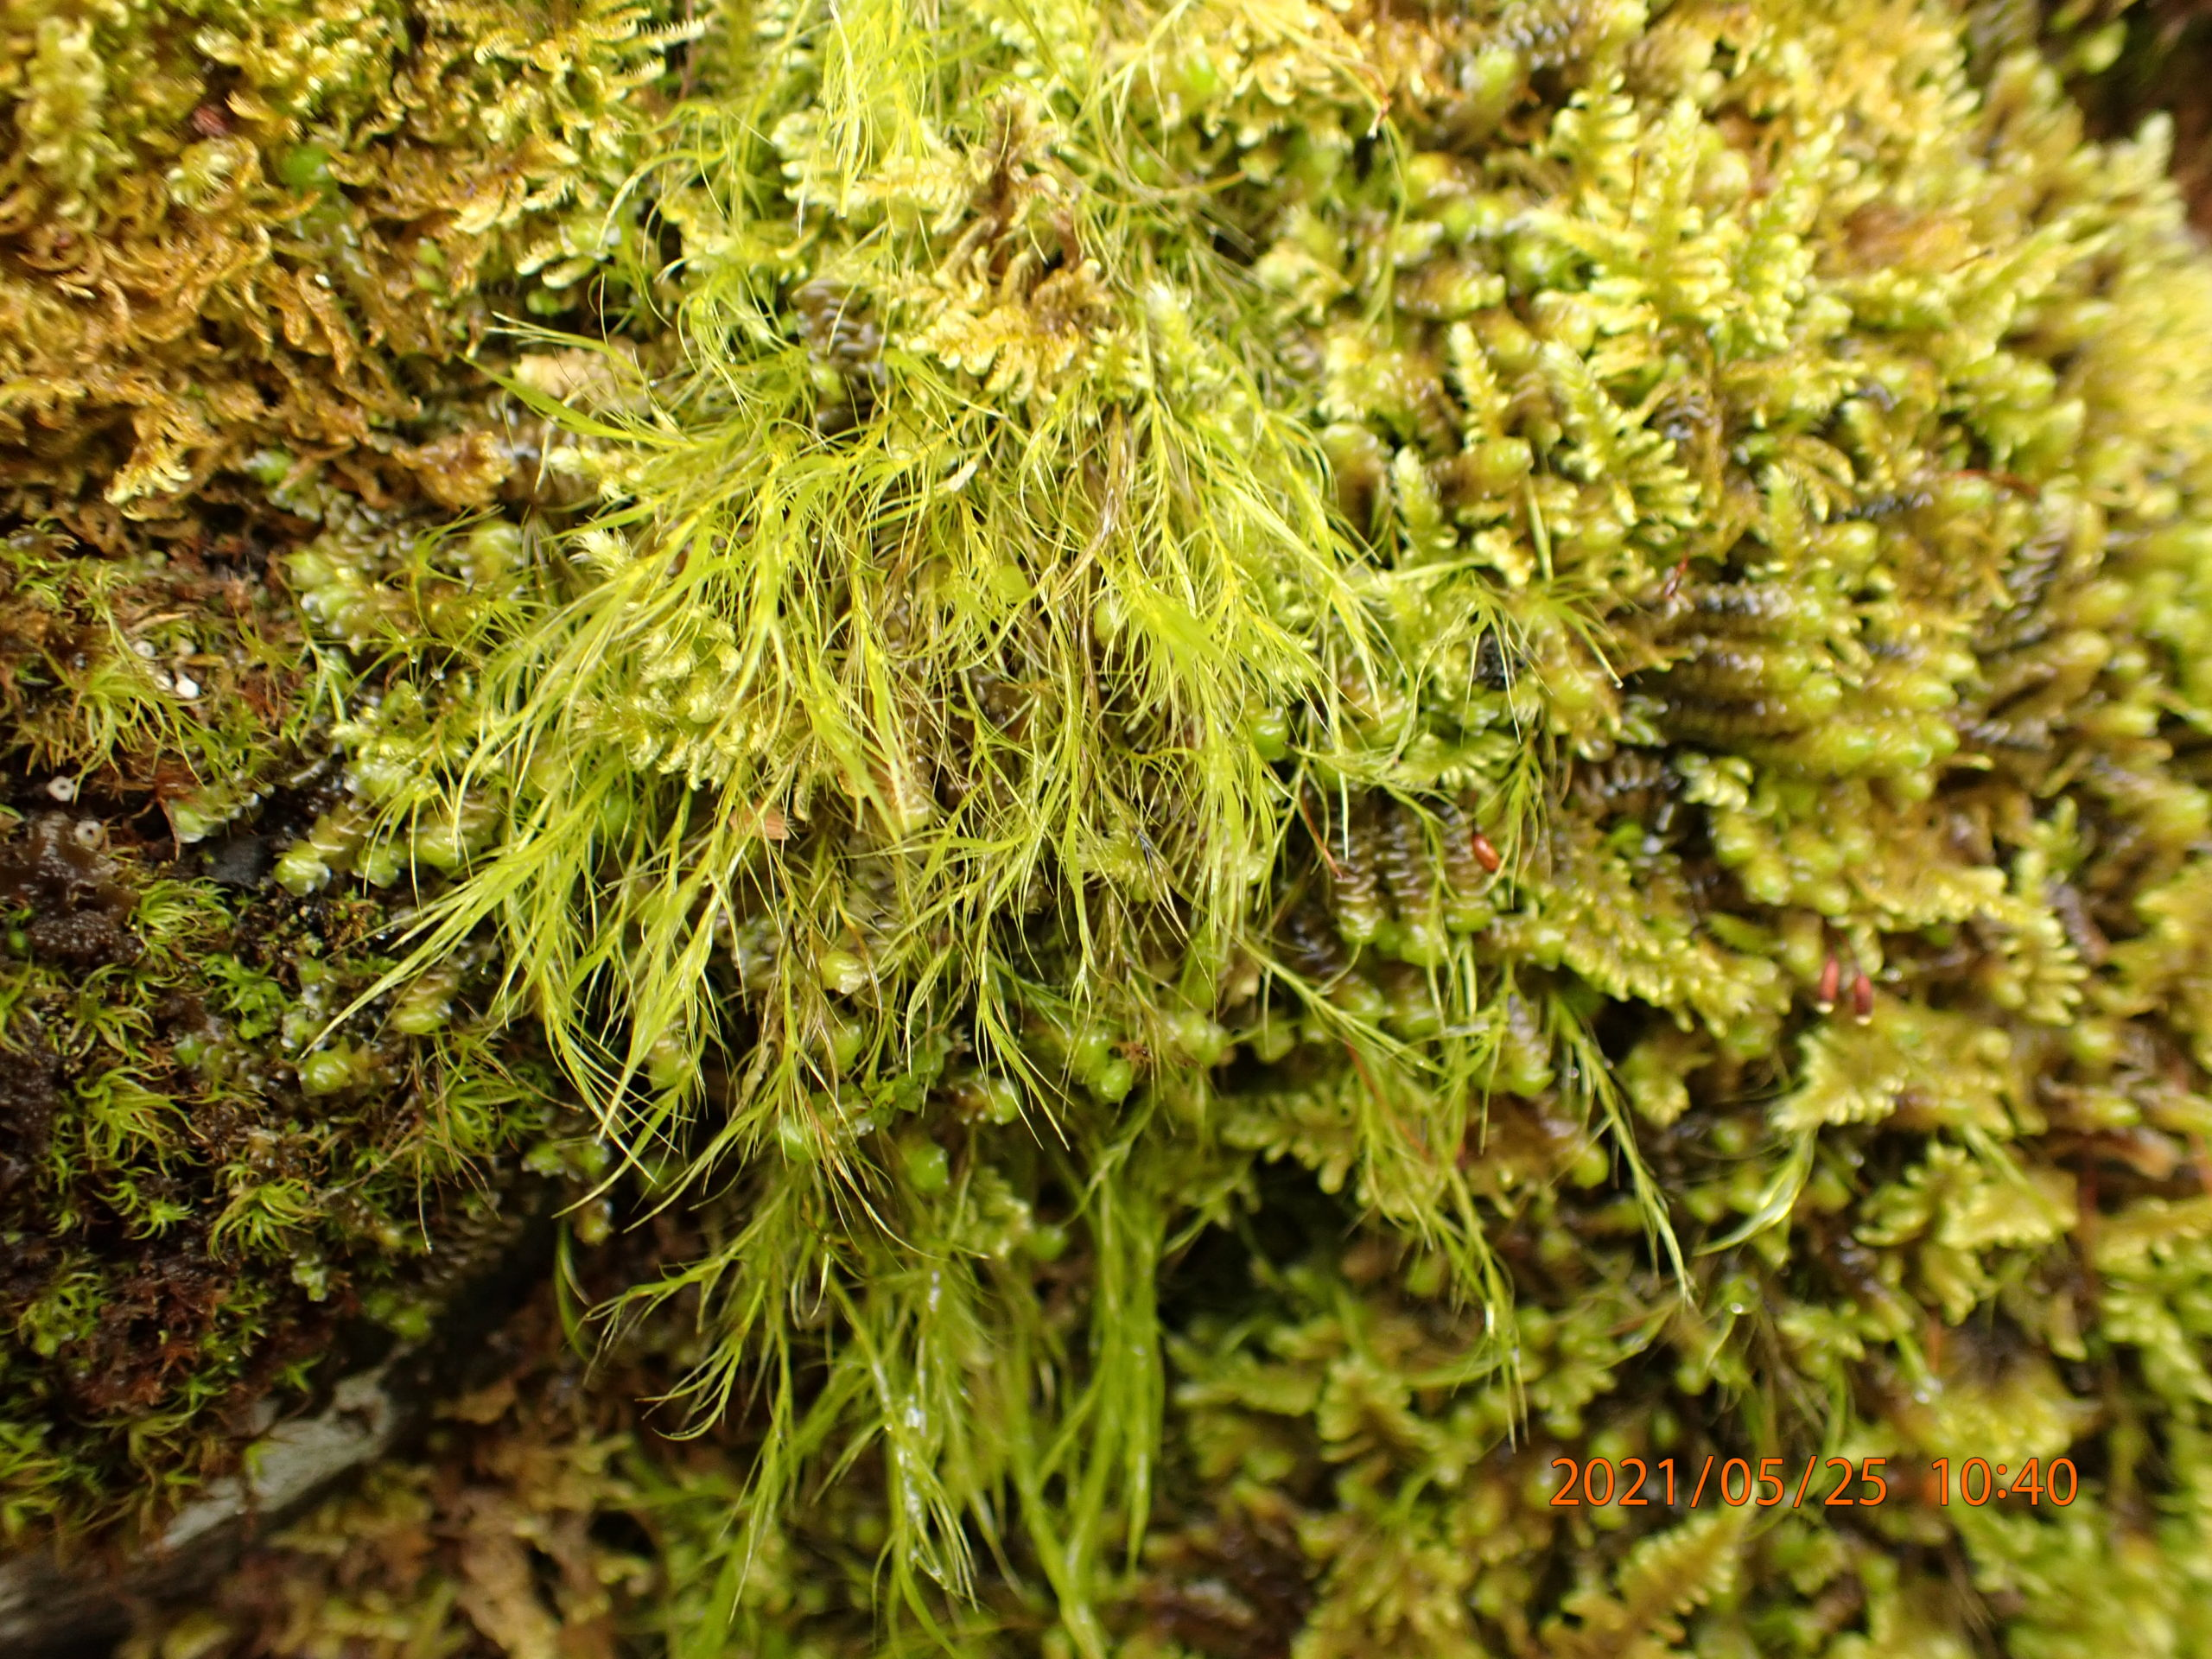 Bryophytes on a stone wall: Flexitrichum gracile (formerly Ditrichum), Scapania aspera, Ctenidium molluscumand Tortella tortuosa.